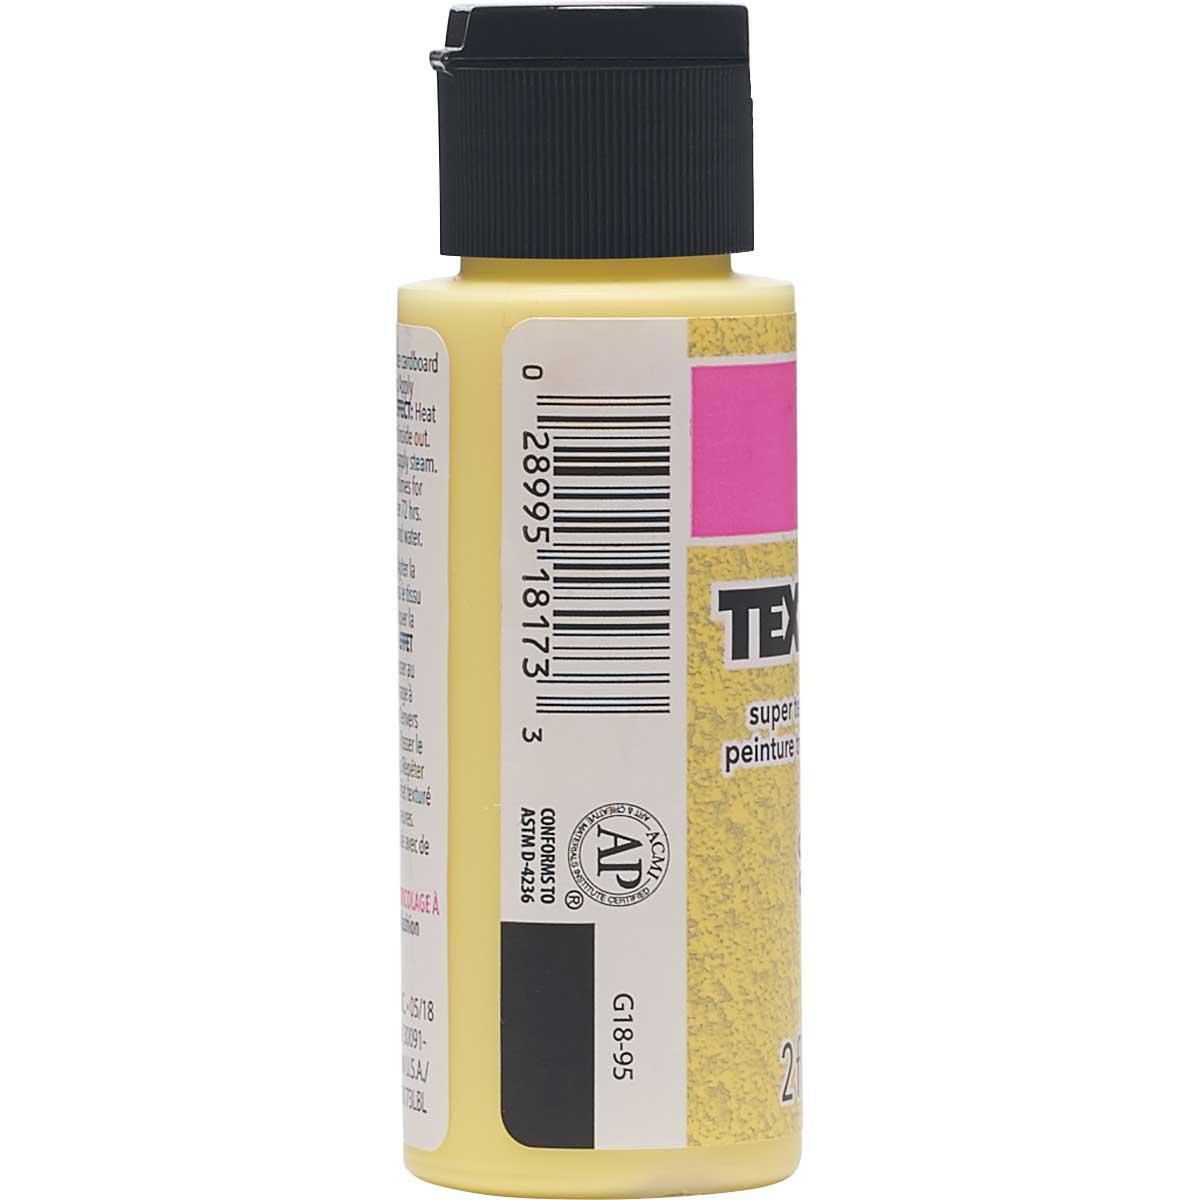 LaurDIY ® Texturific™ Fabric Paint - California,2 oz. - 18173